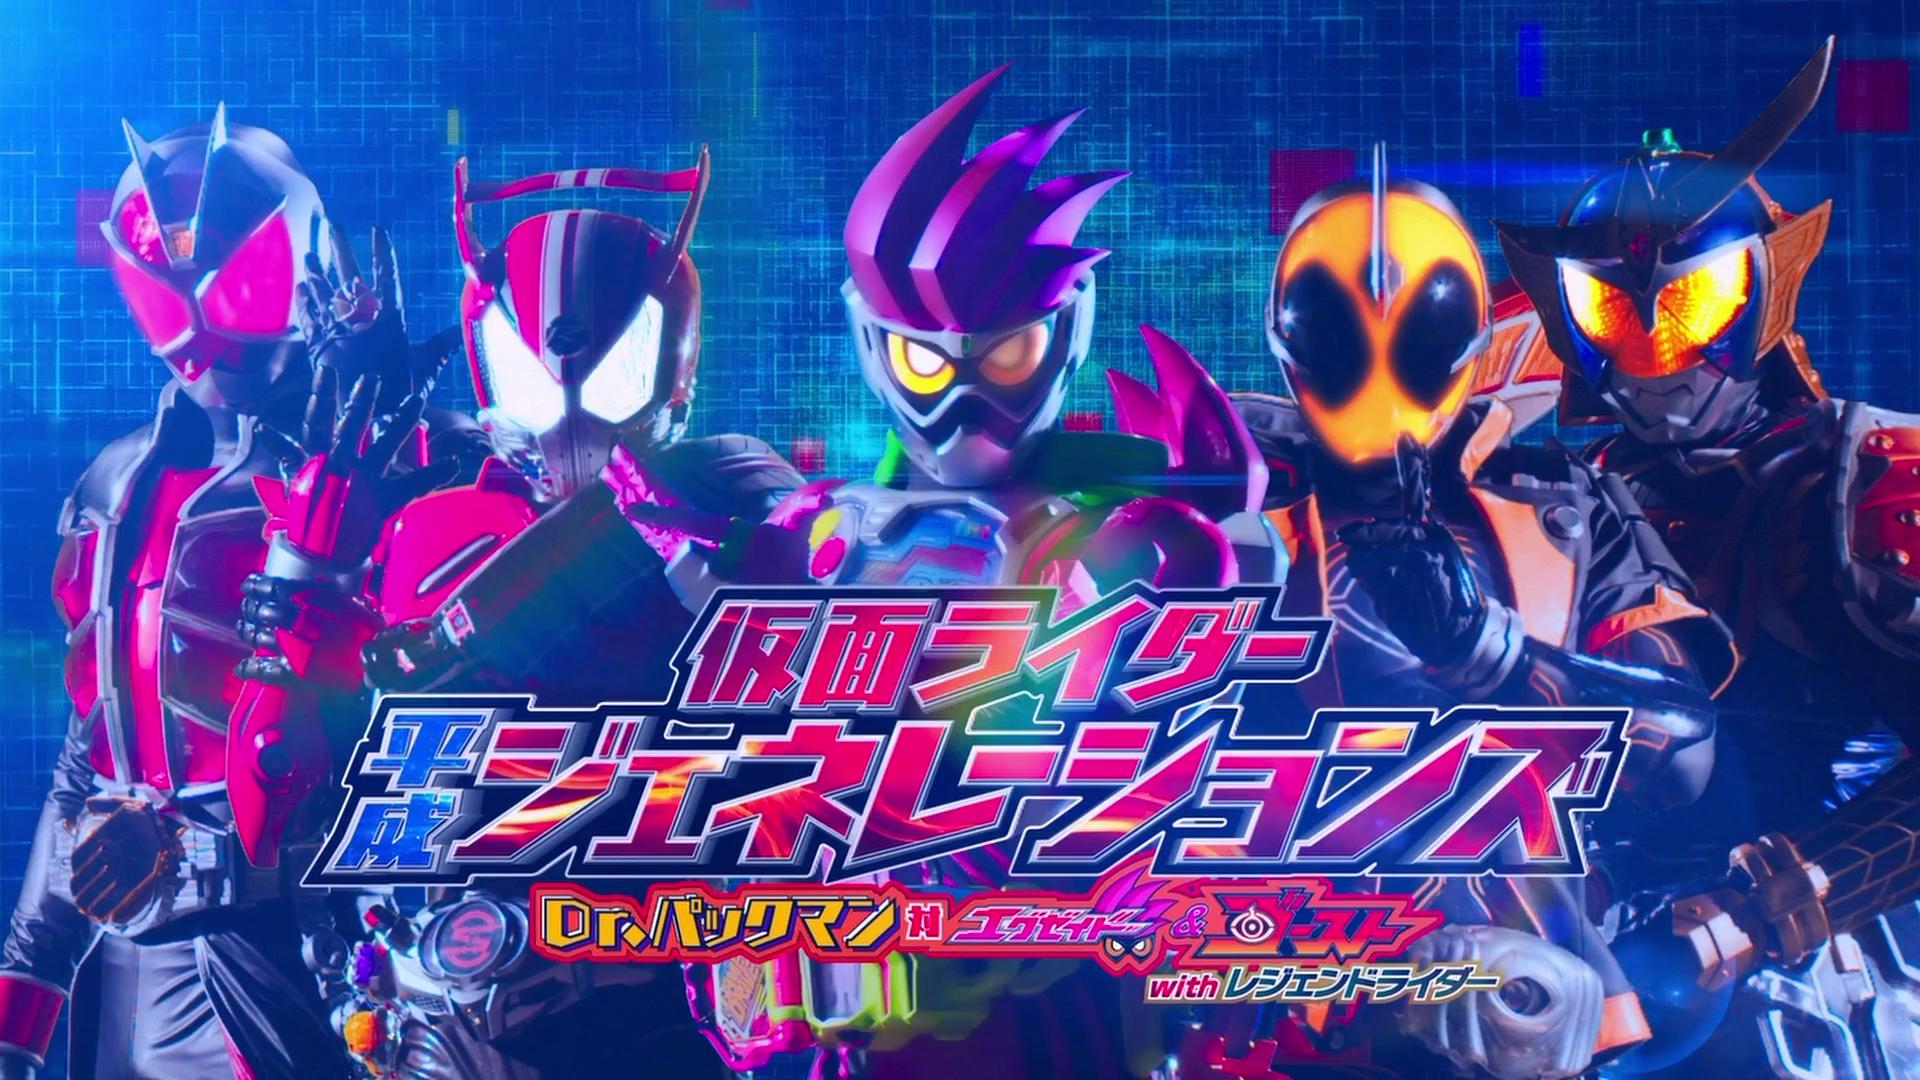 Kamen Rider Heisei Generations Dr Pac Man Vs Ex Aid Ghost With Legend Rider 4